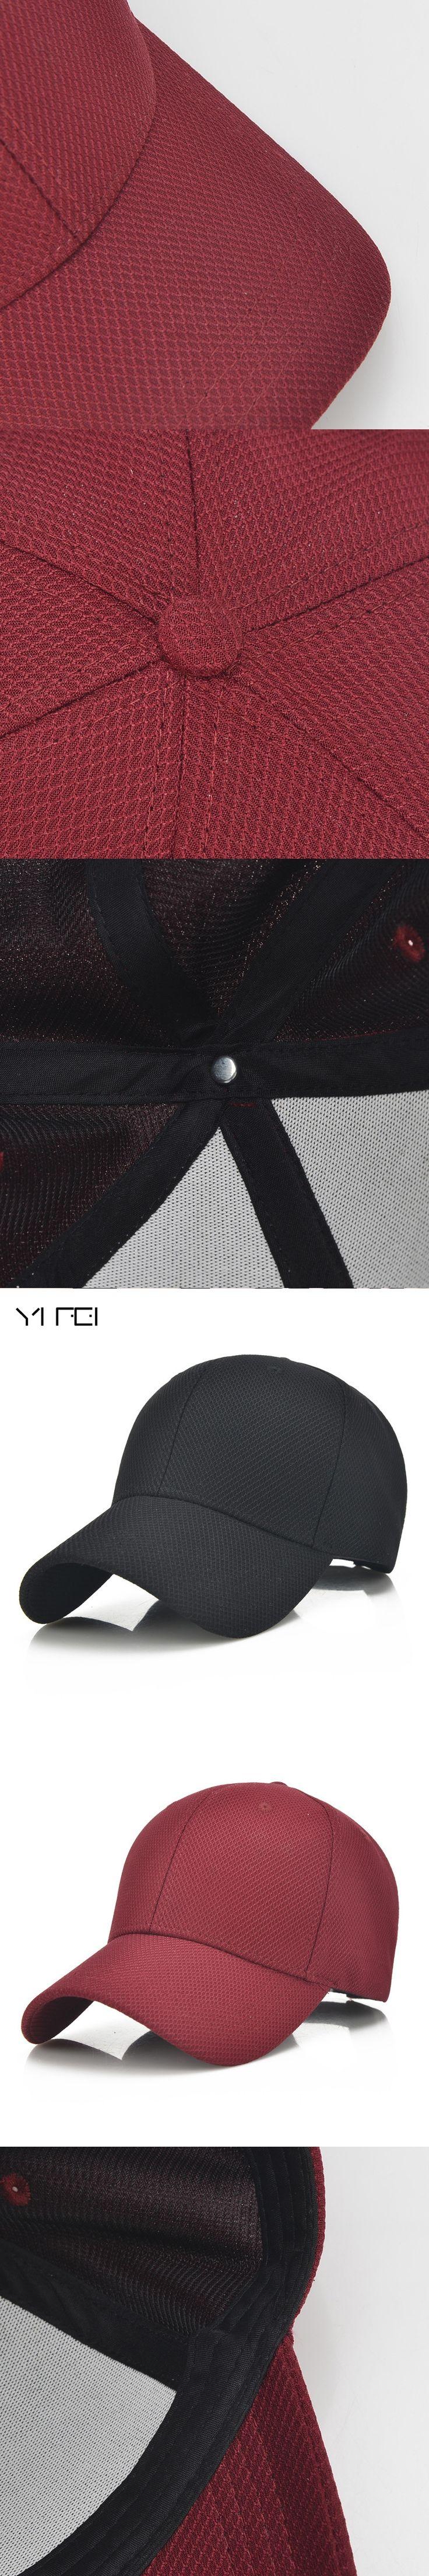 YIFEI 2017 Unisex Women Baseball Cap Men Cotton Breathable Mesh Cap  Bone Snapback Golf Hats Black Gorras Cap Summer Hat Outdoor